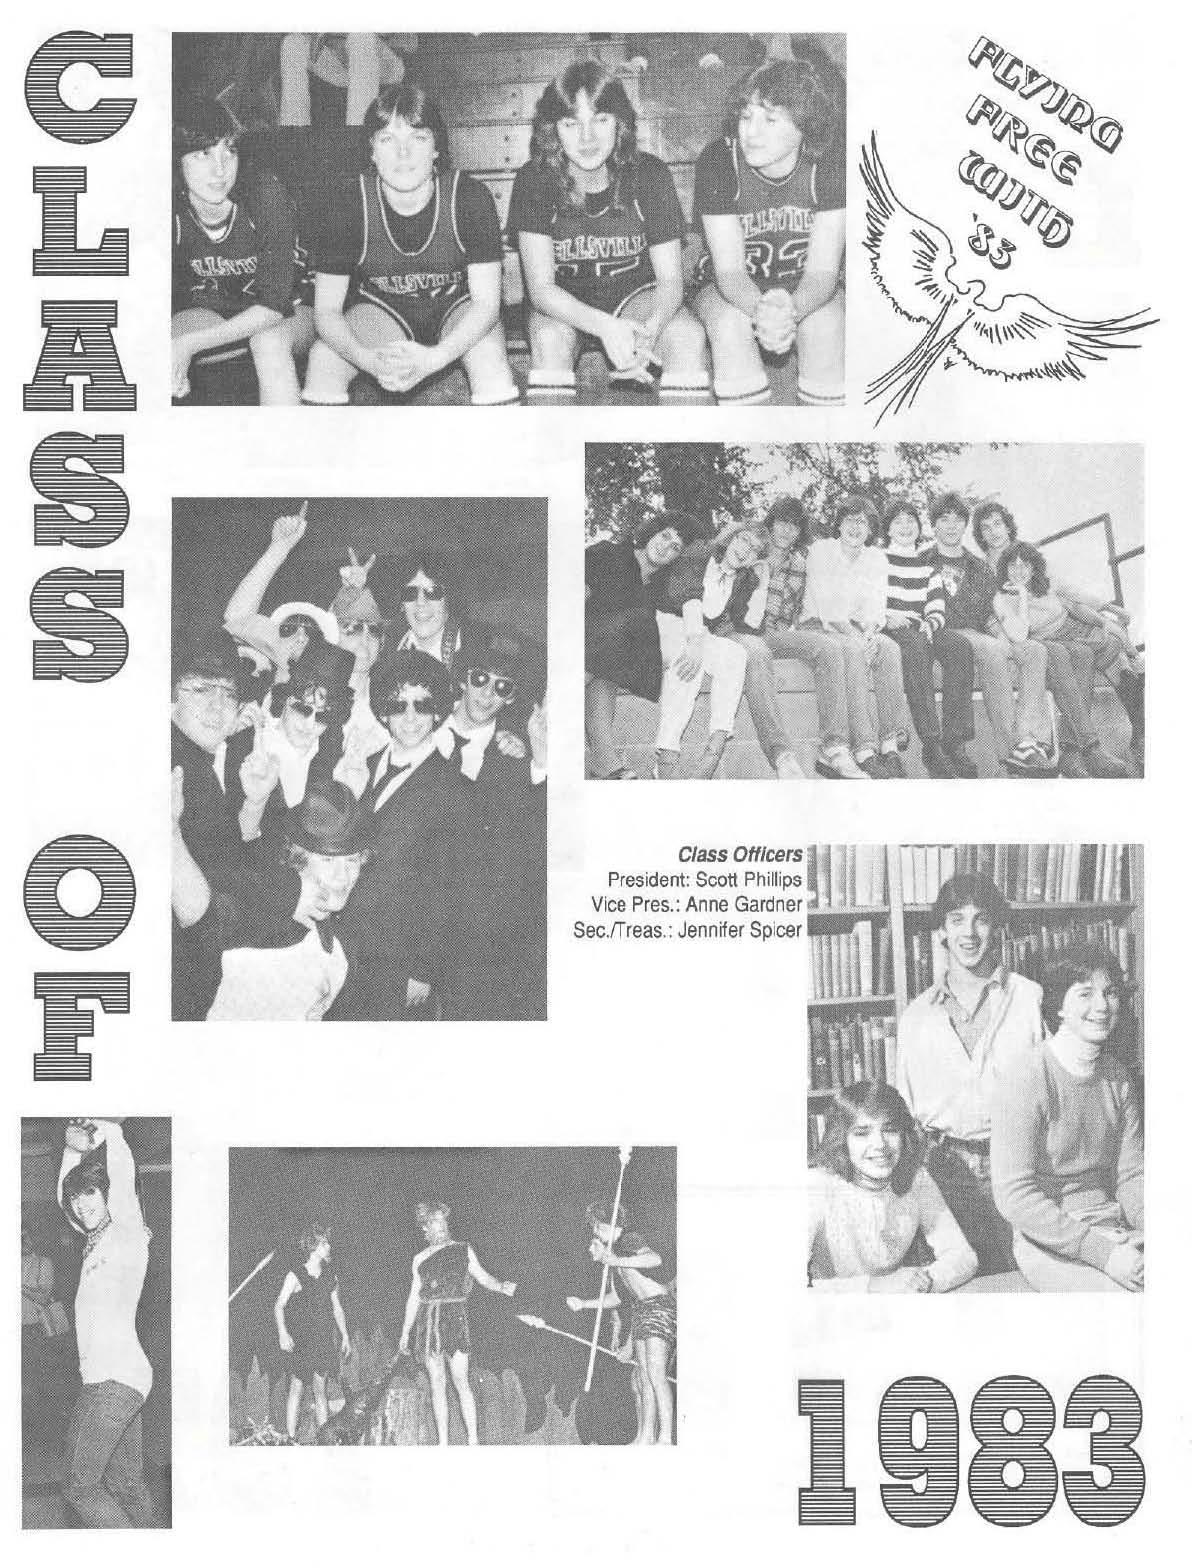 1993 1983